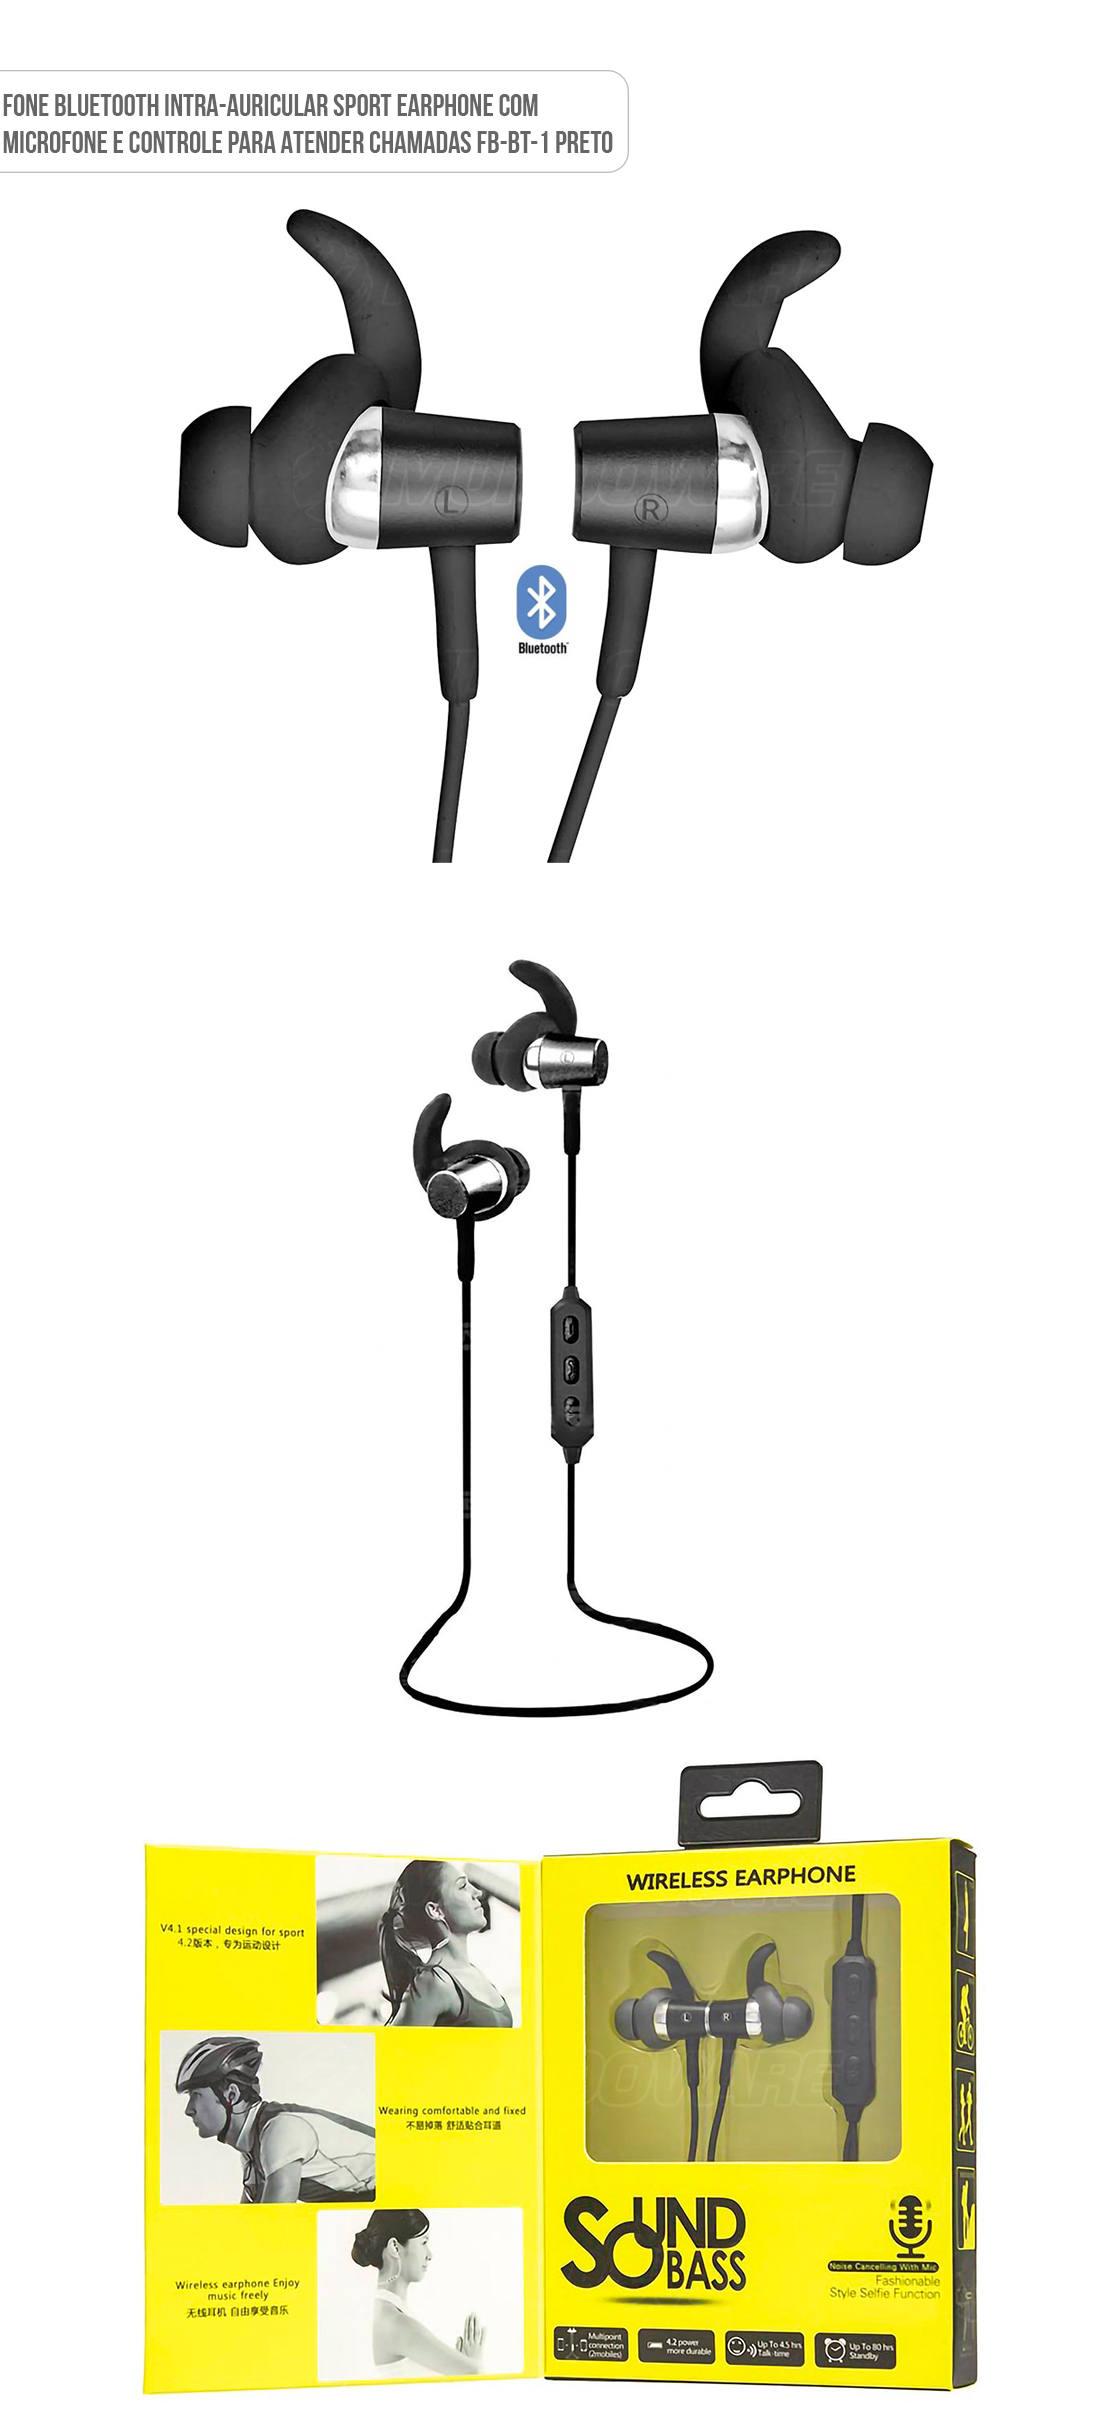 Fone de Ouvido intra-auricular esportista bluetooth Fbbt1